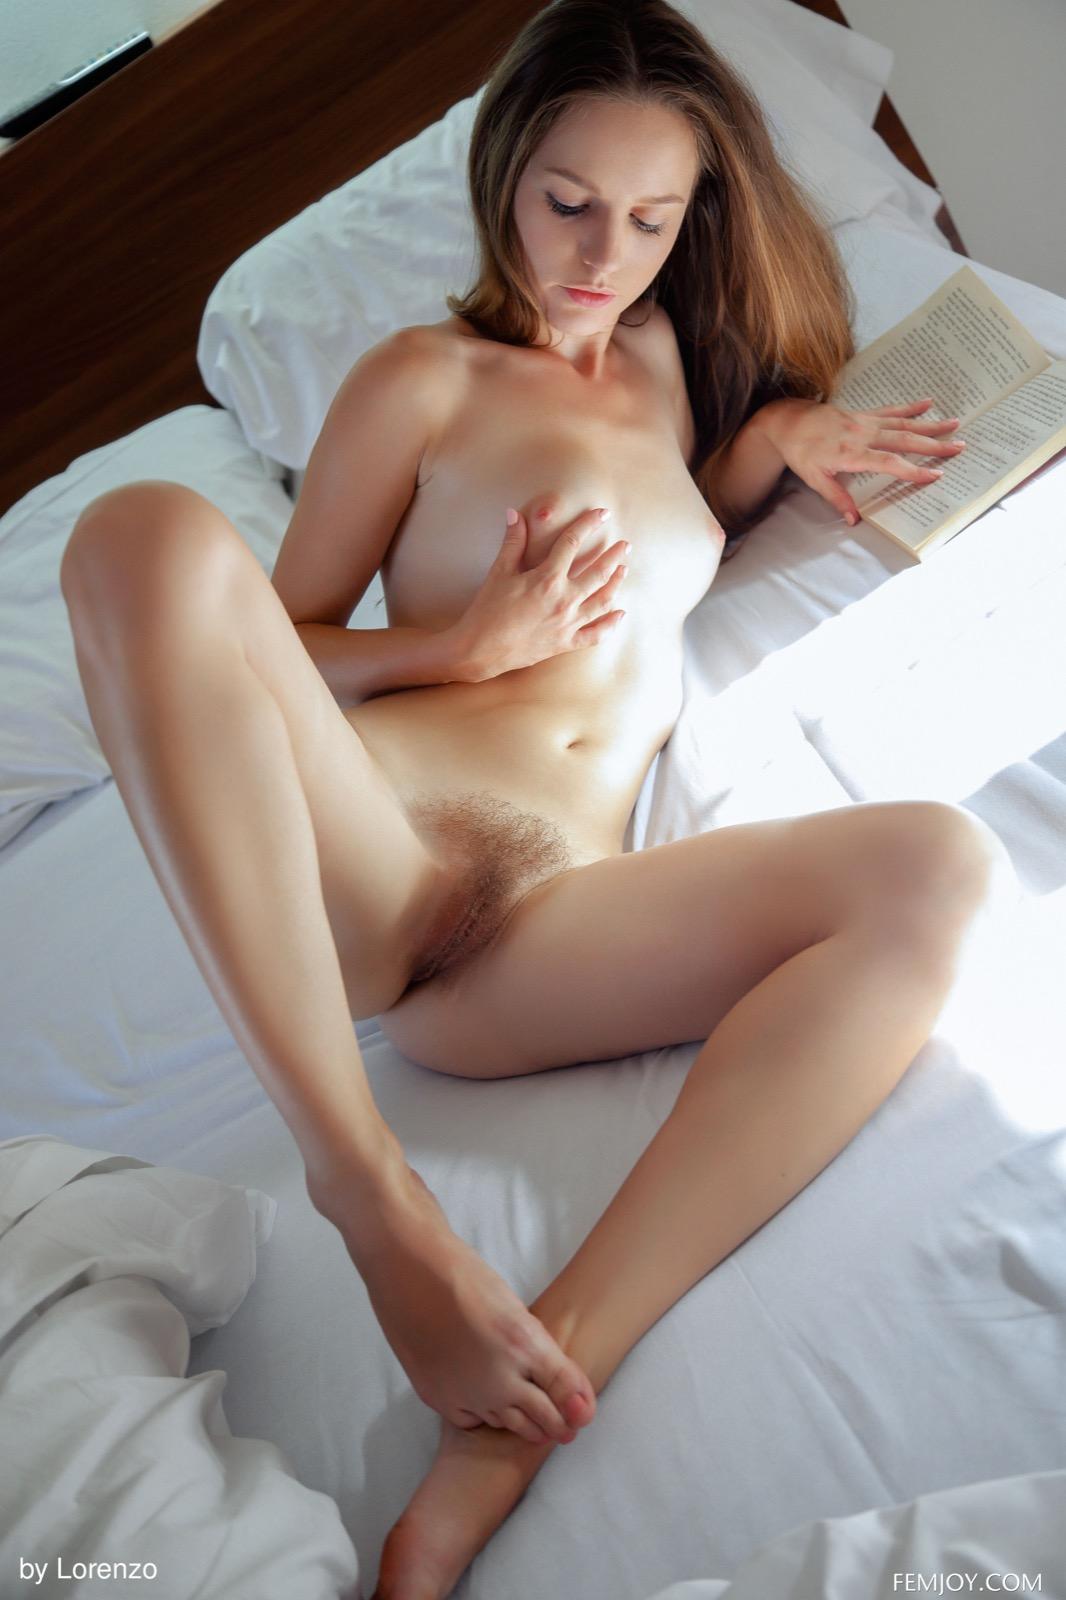 sofie_s_23_49500_10.jpg